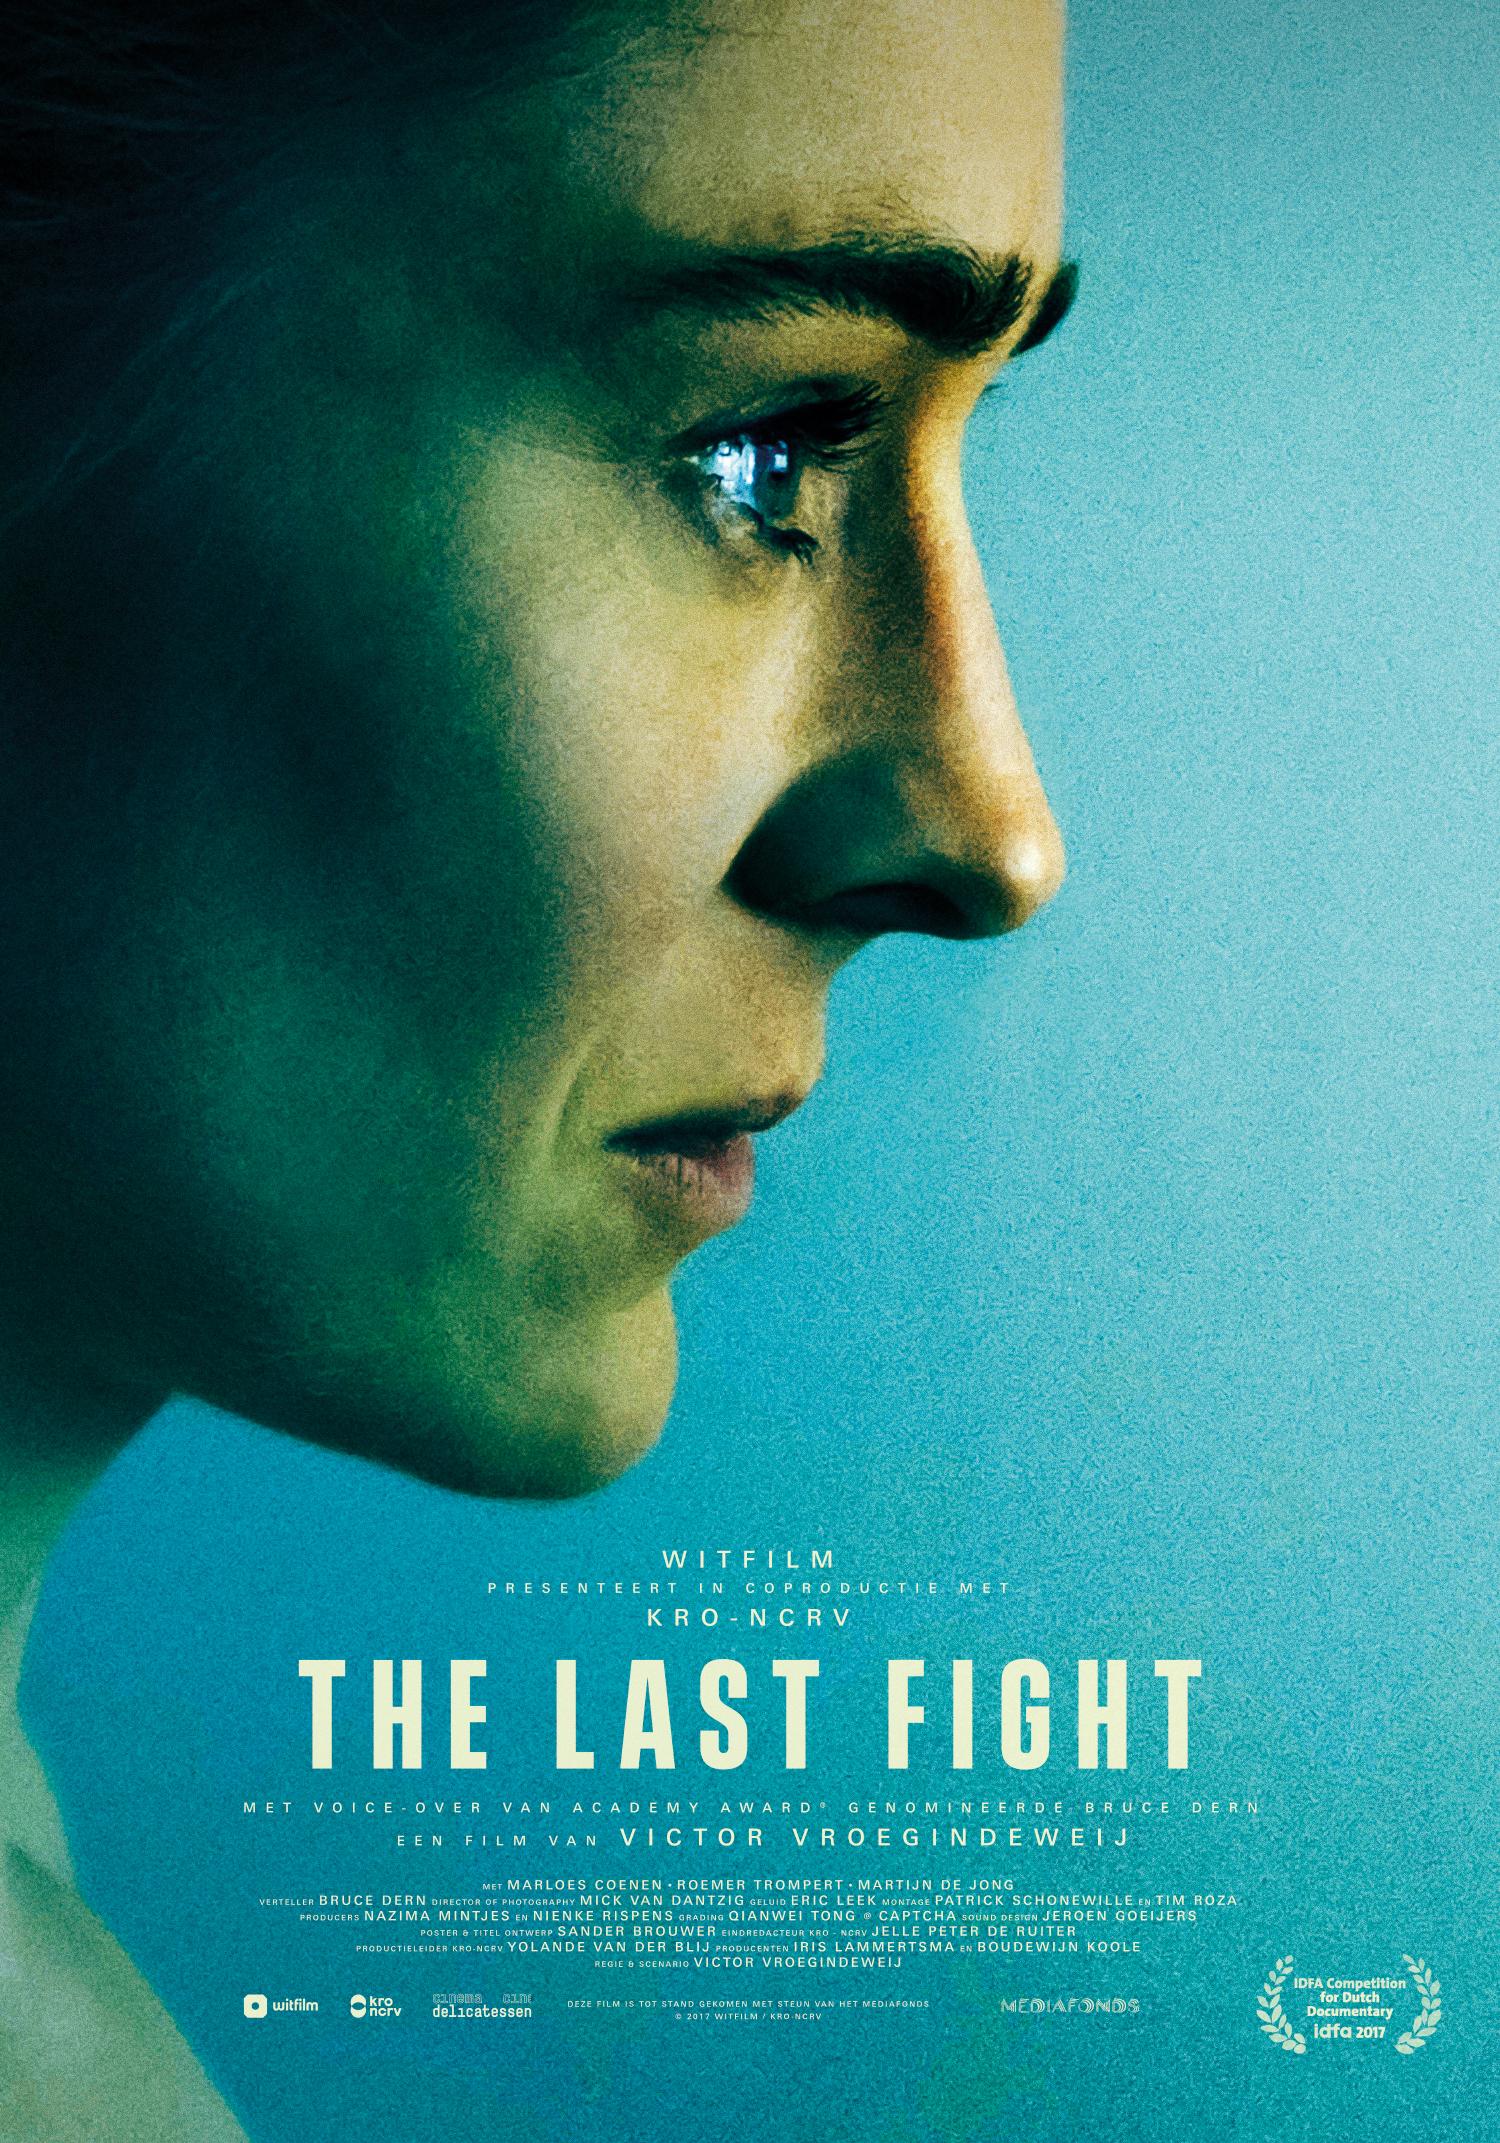 The Last Fight 2018 Imdb